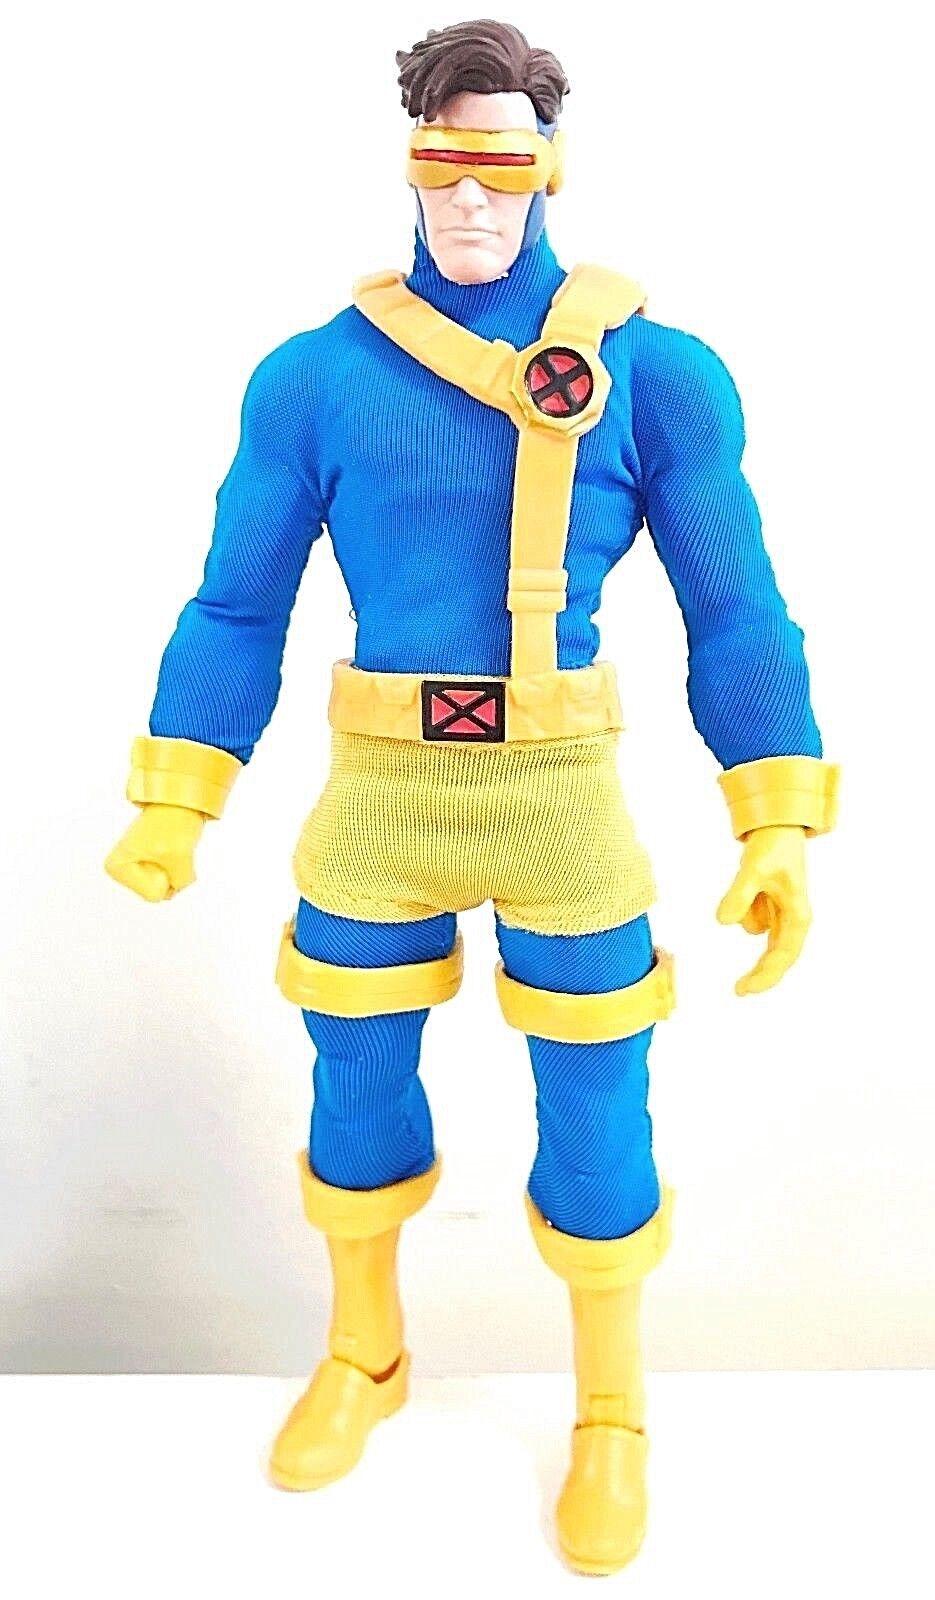 for Mezco Punisher body Bestlee Shadow spider boy Suit 4 pcs BL-DKSPD-SET